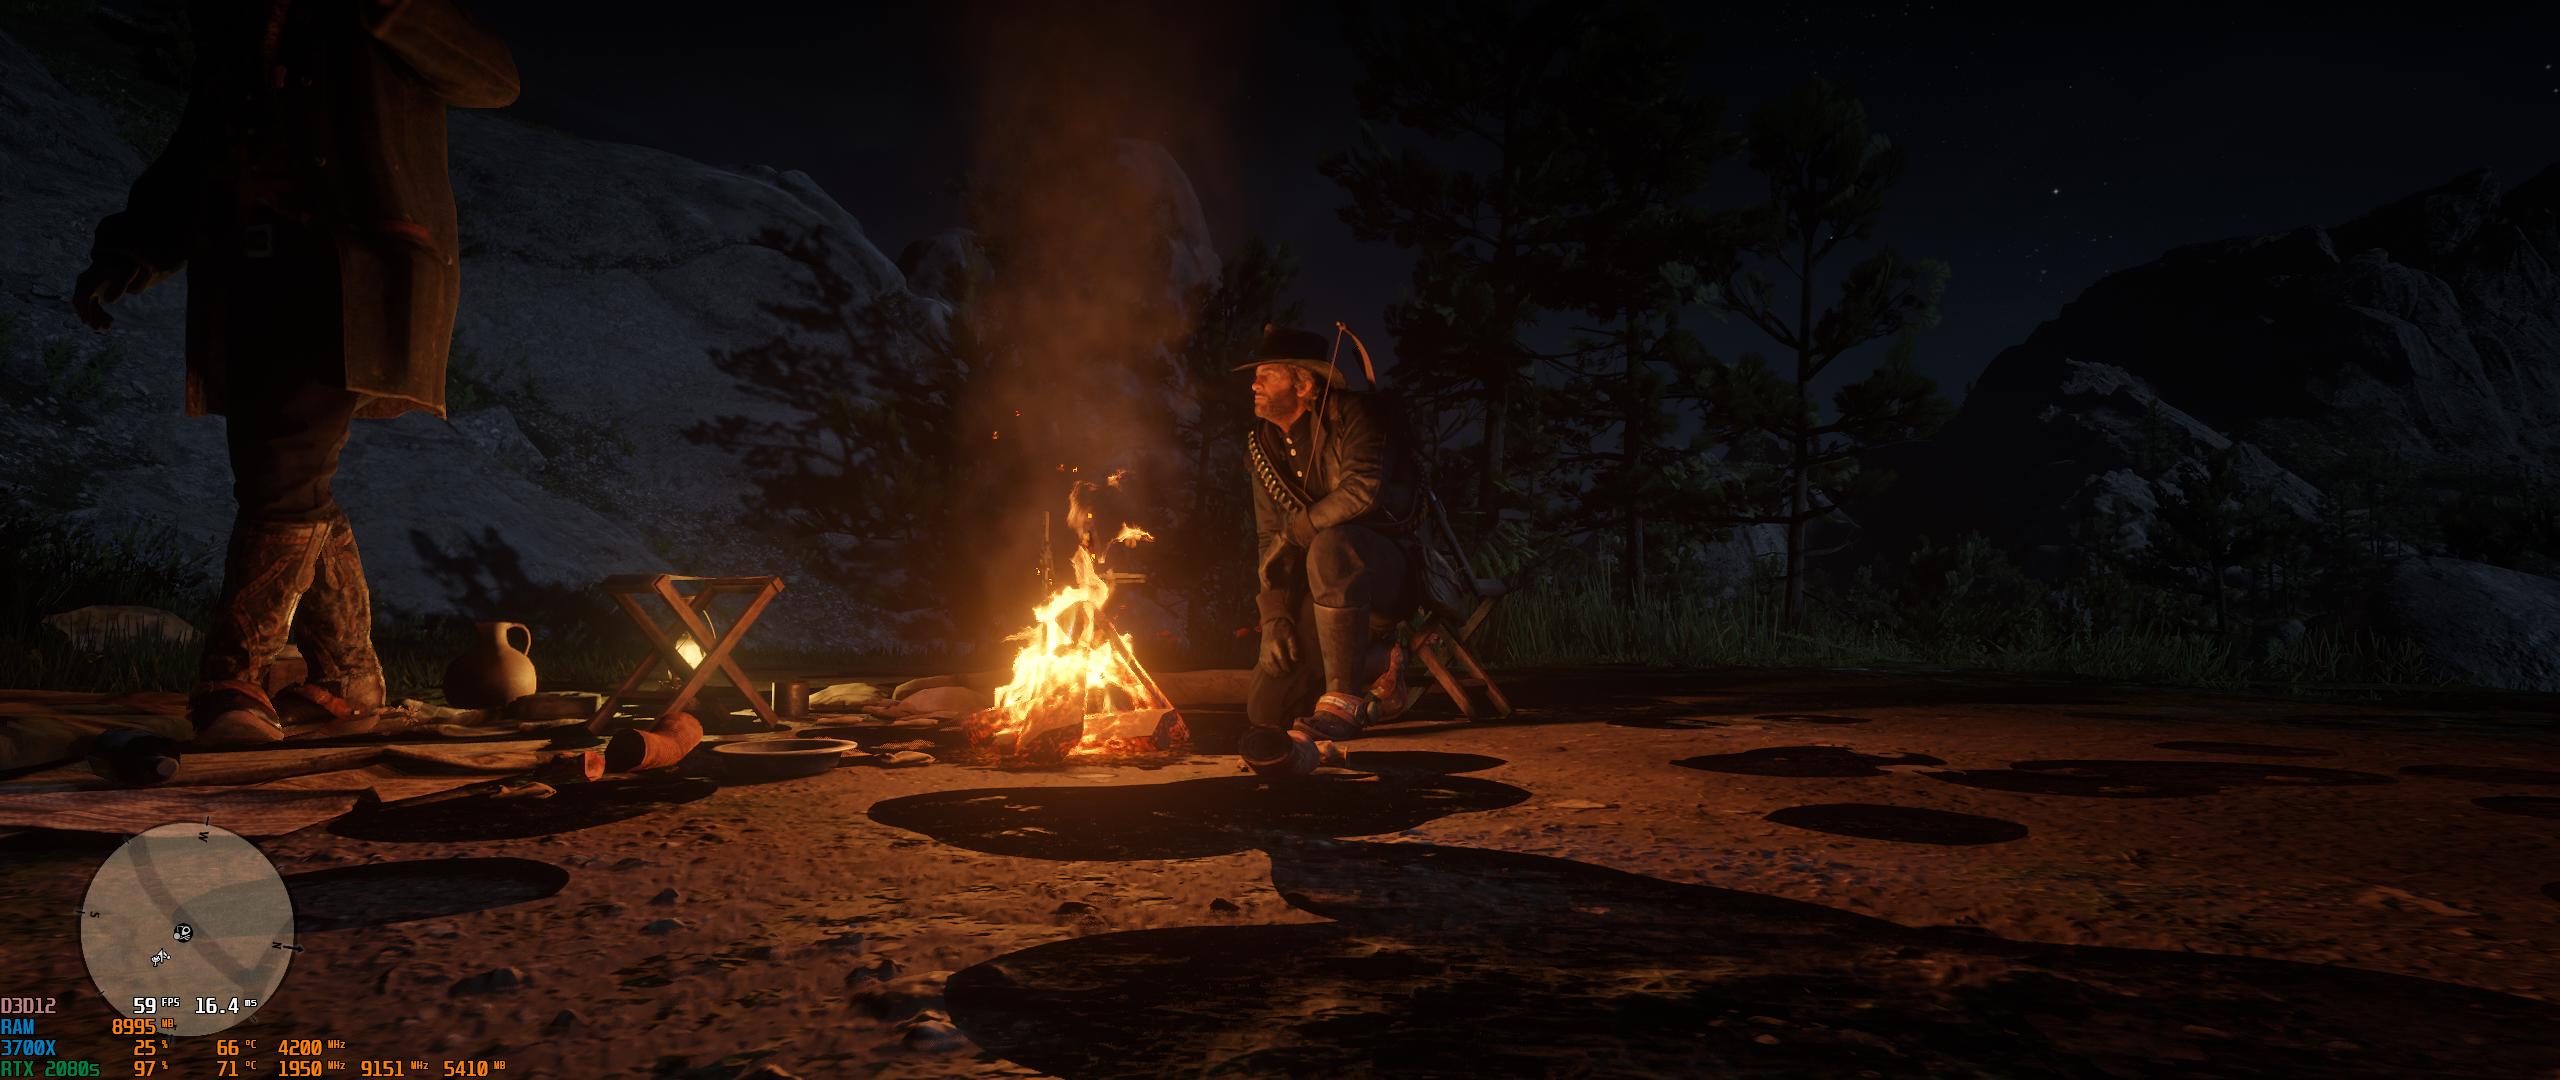 Red Dead Redemption II Screenshot 2019.11.06 - 12.53.59.44.png - Red Dead Redemption 2